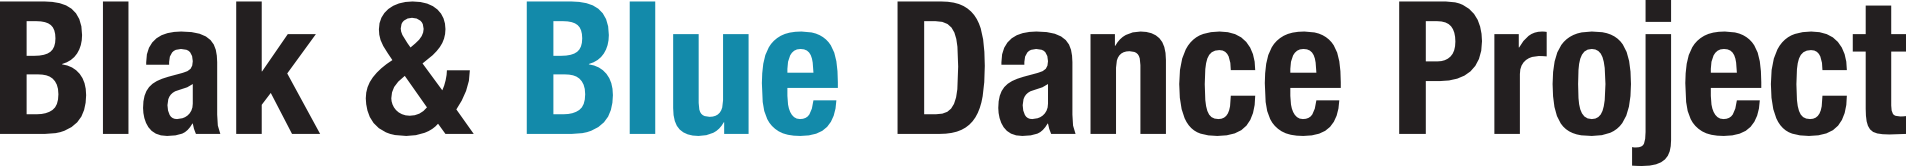 BlakAndBlue_Logo.png